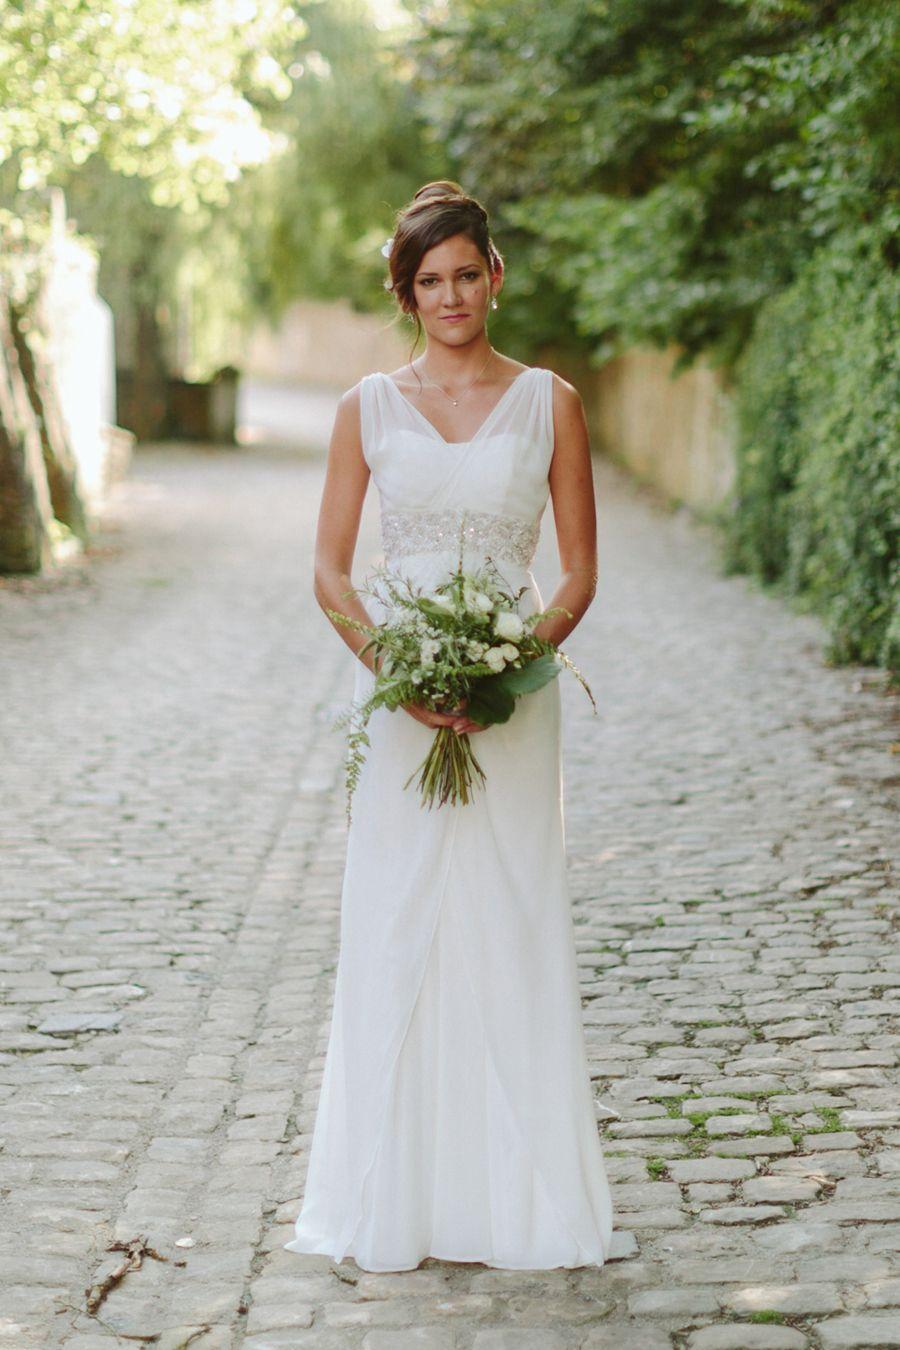 Bride with Handmade Bouquet at Château de Bourglinster  #castlewedding #luxembourg #hochzeit #chateau #luxembourgwedding #weddingphotography